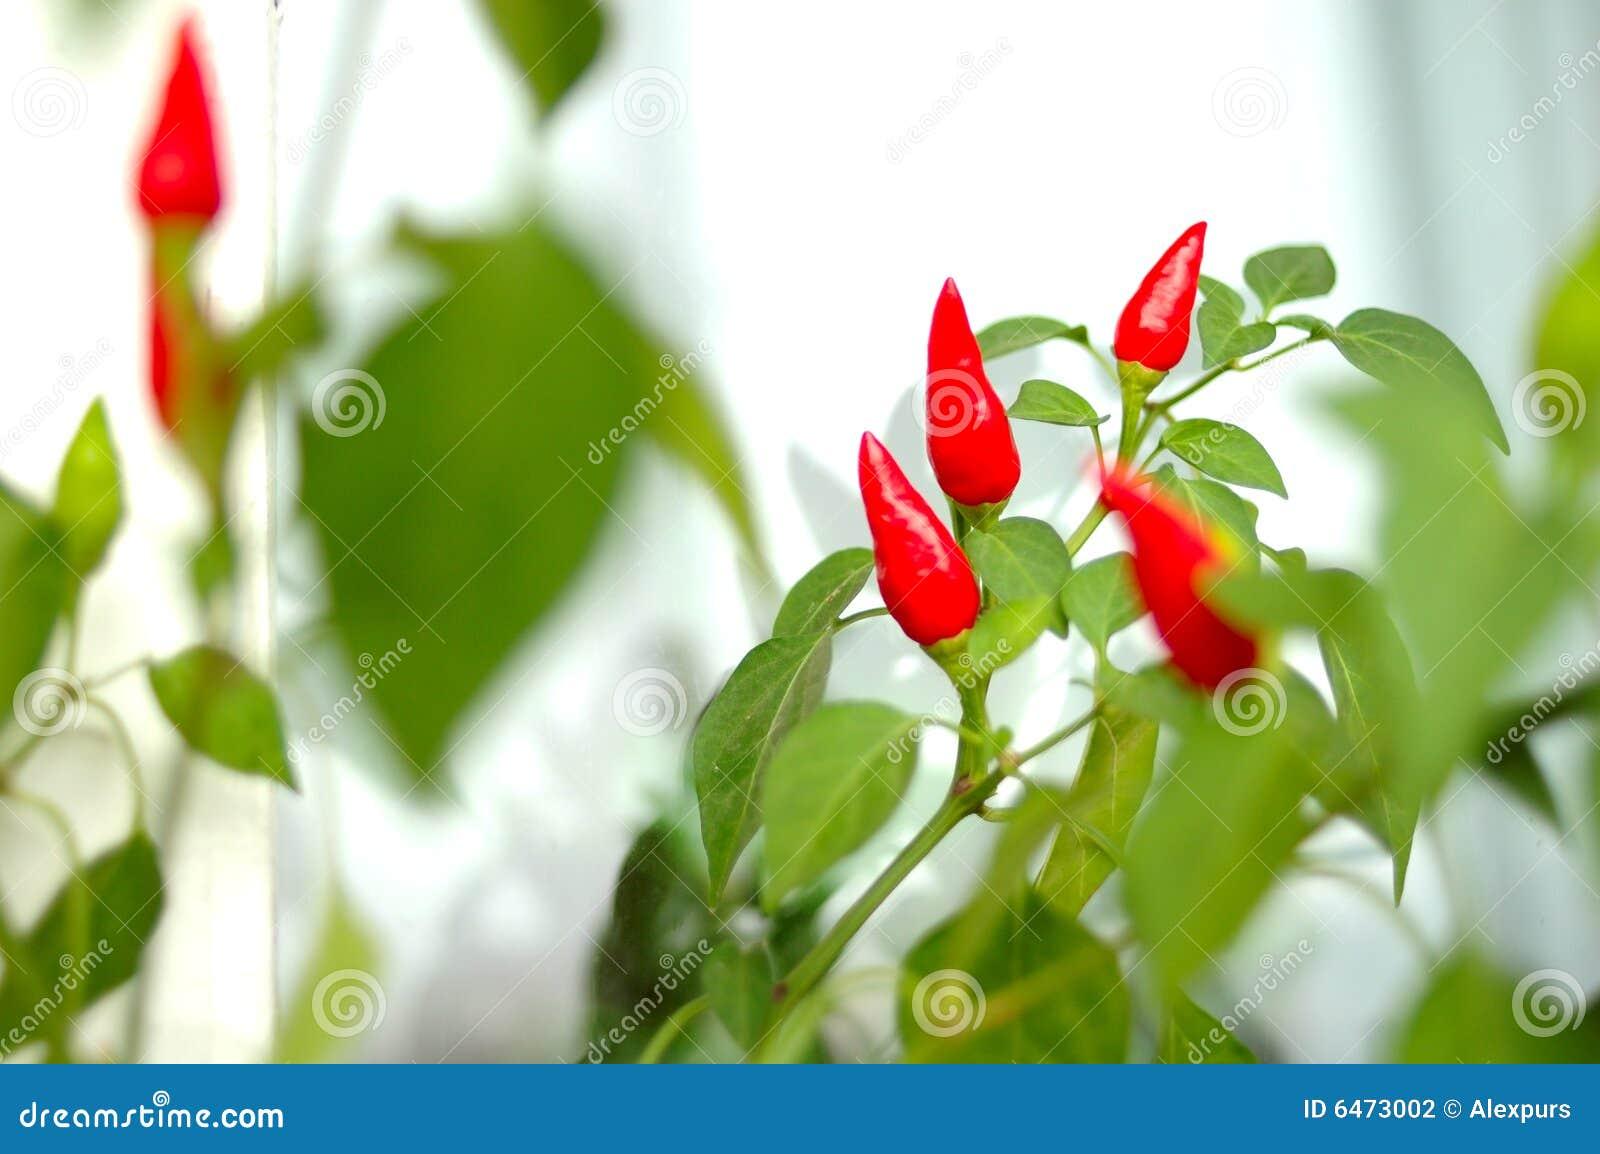 Rośliny capsicum Cayenne